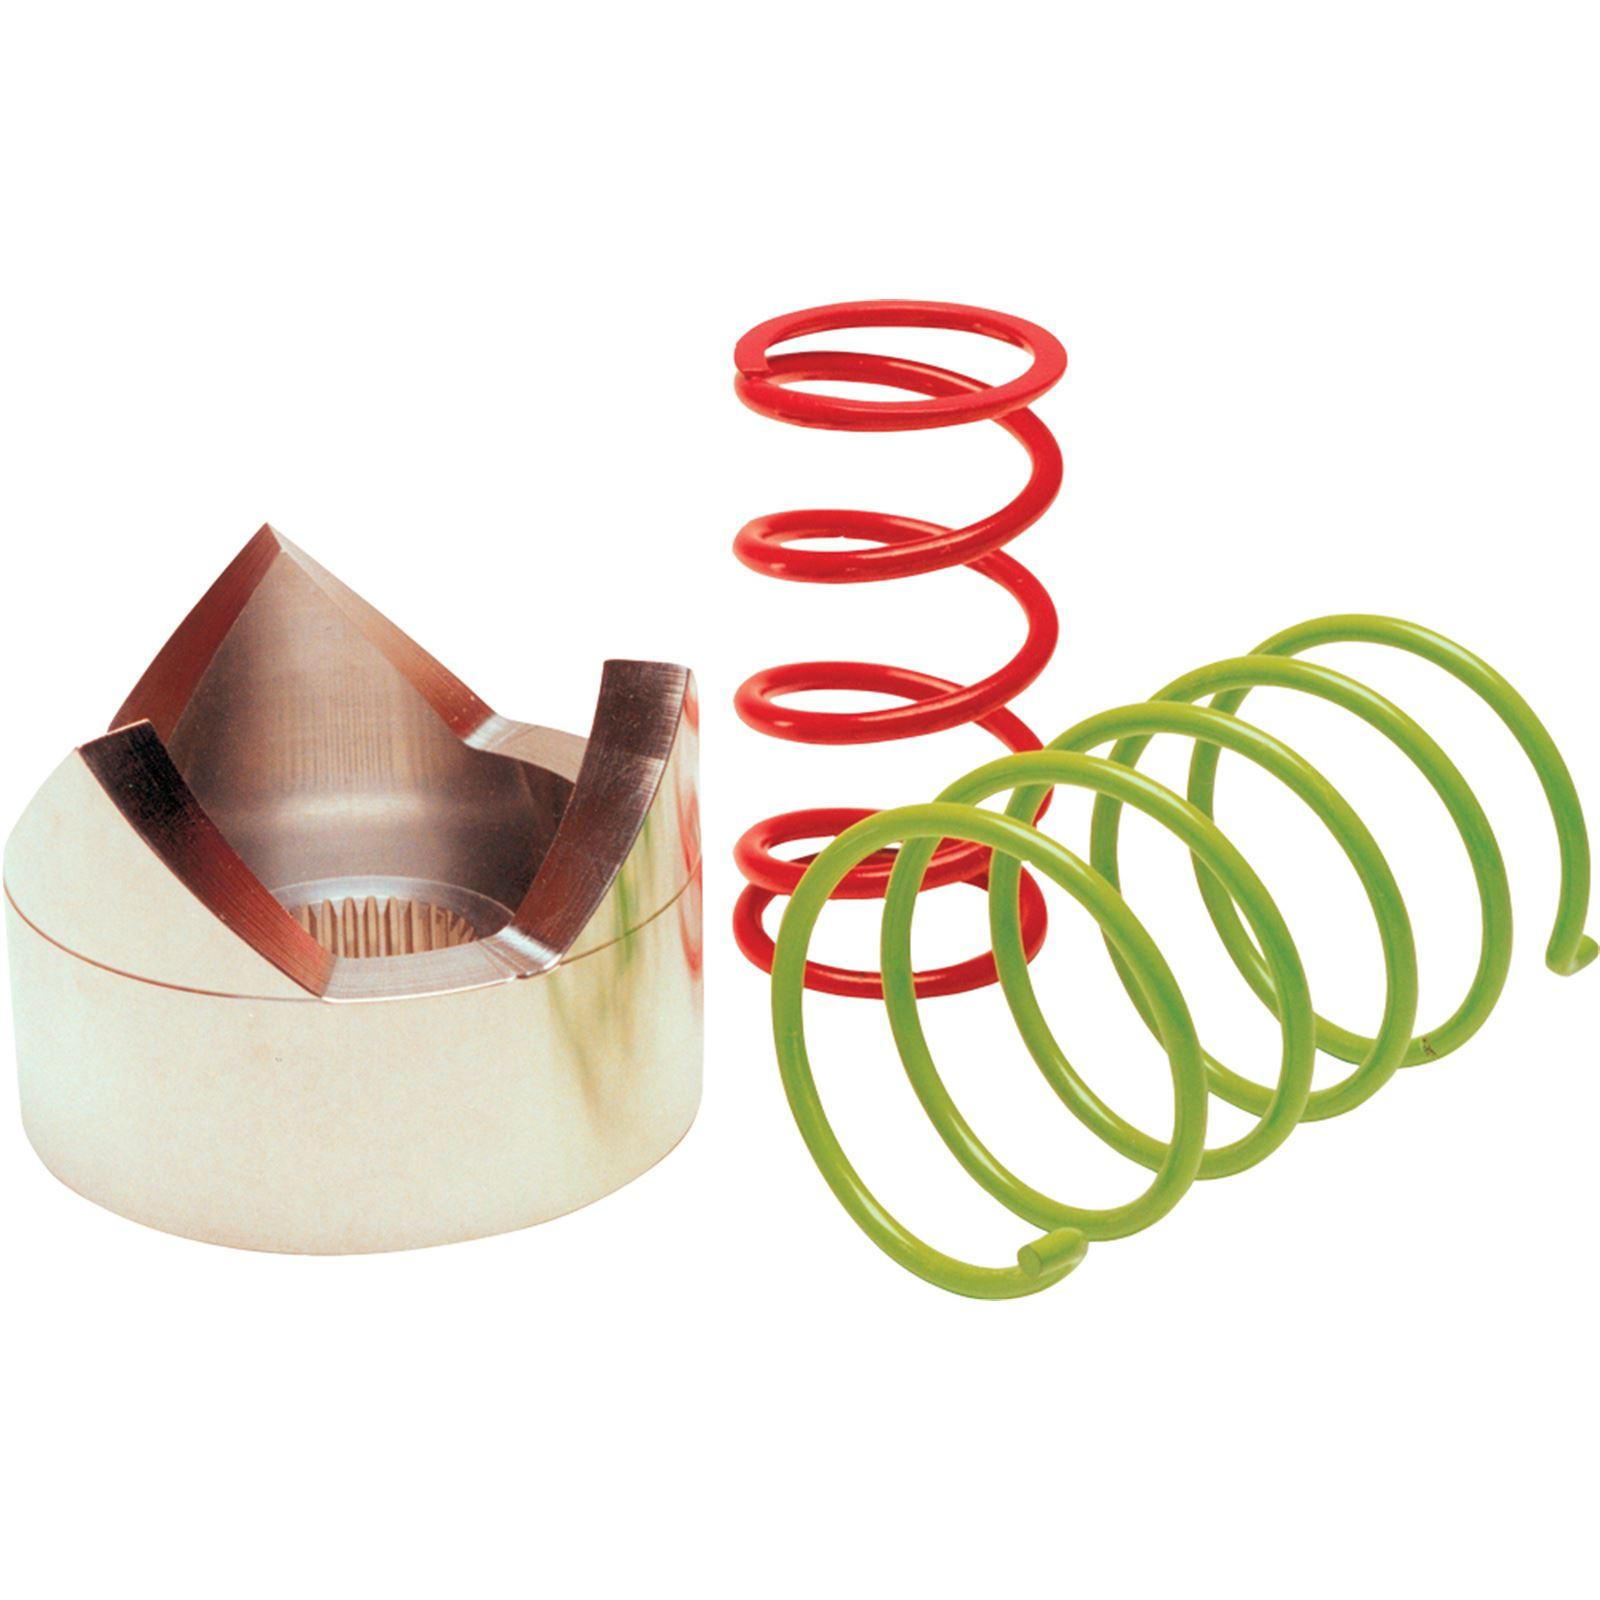 EPI Dune Clutch Kit